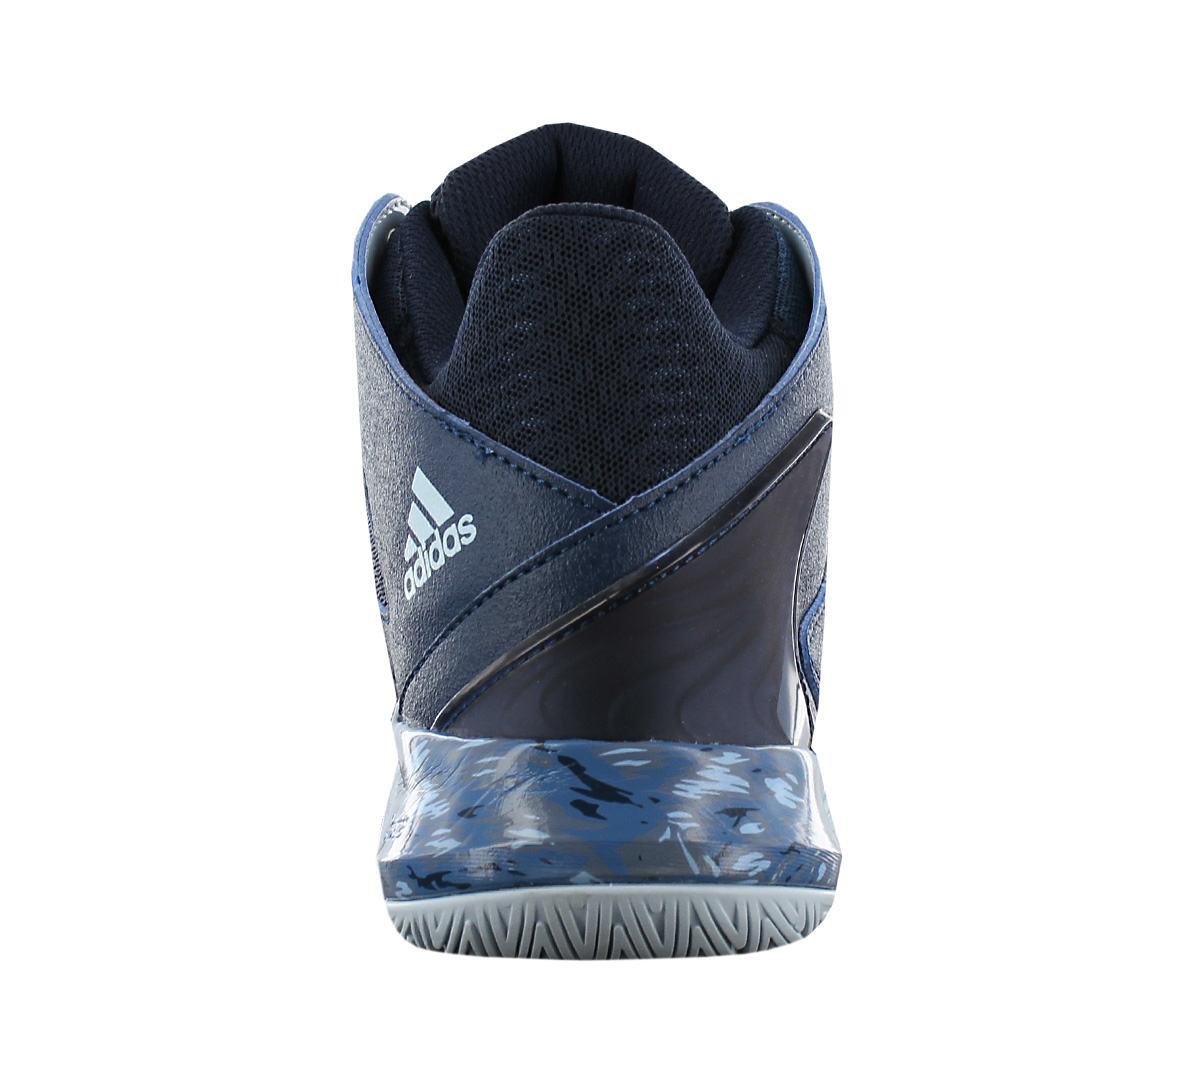 super popular b0f09 97f31 Adidas Derrick D Rose 773 V Mens Basketballshoe Basketball S